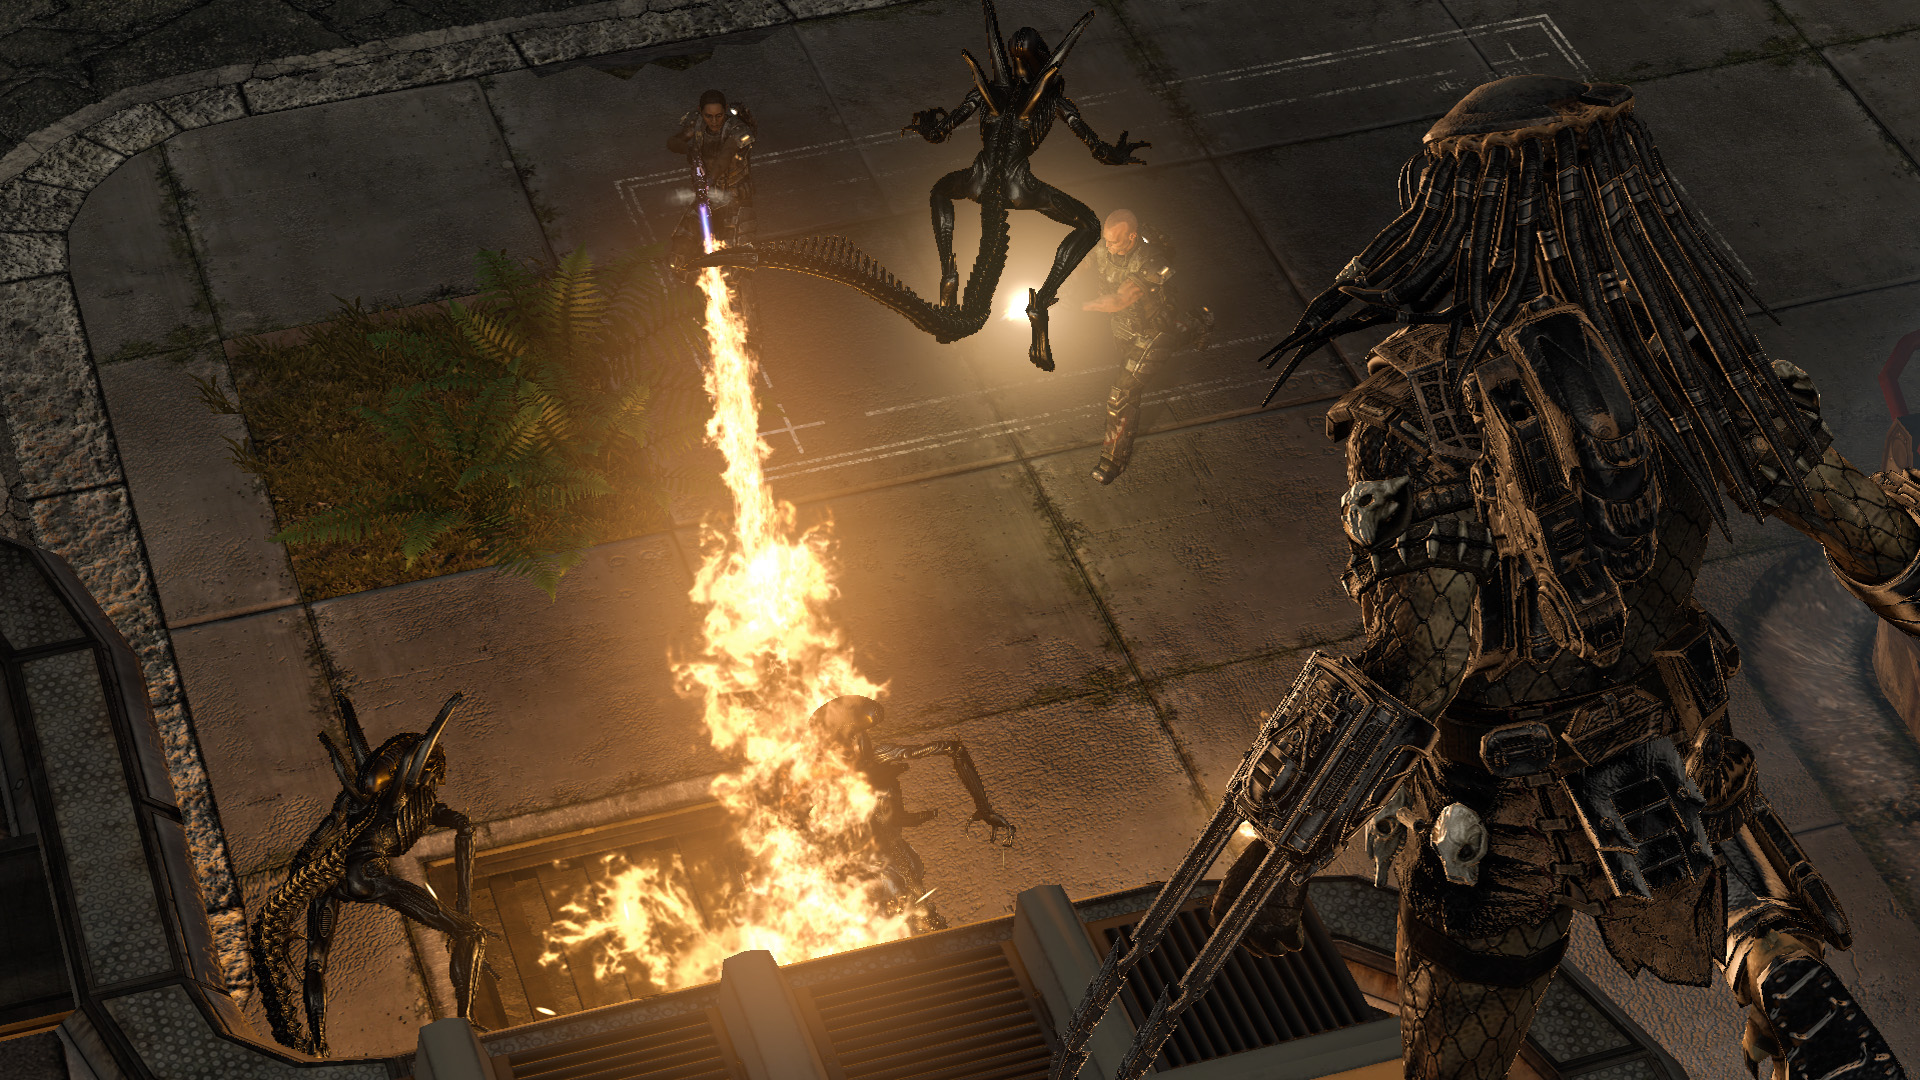 Aliens Vs. Predator wallpapers or desktop backgrounds  |Alien Vs Predator Xbox 360 Wallpaper